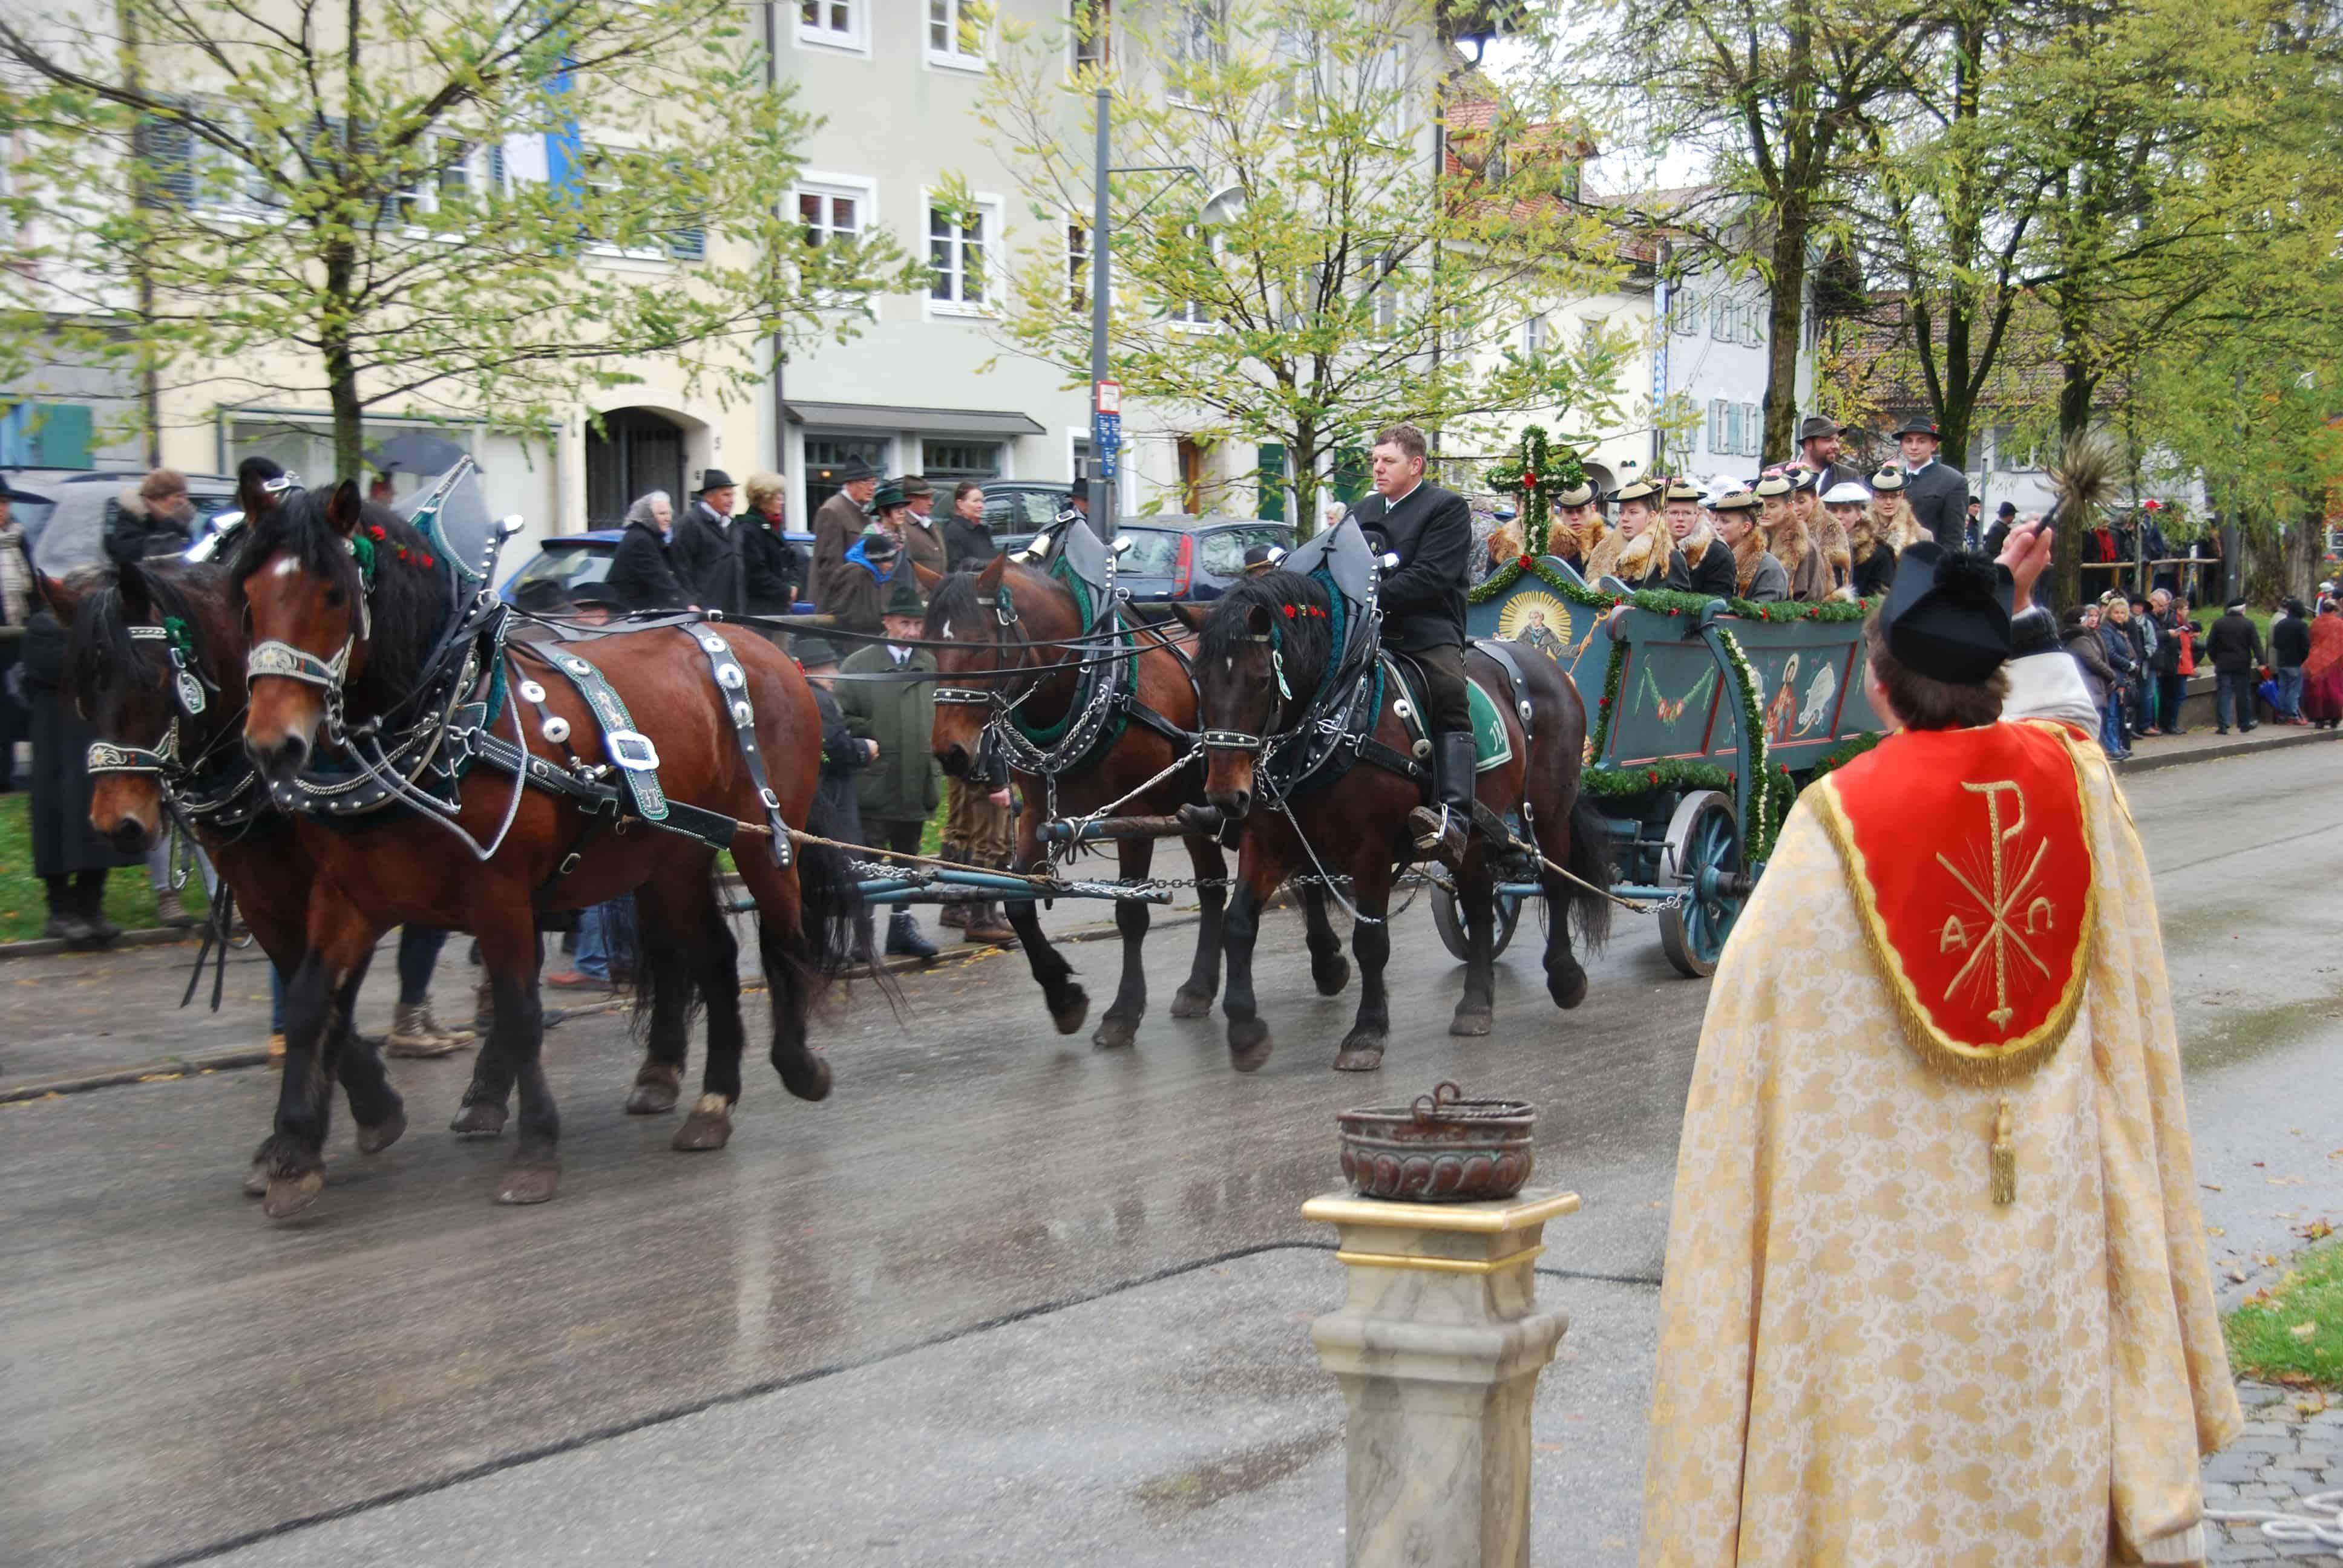 00_Leonhardi-Wallfahrt-Bad-Toelz-Oberbayern-Bayern-Segnung